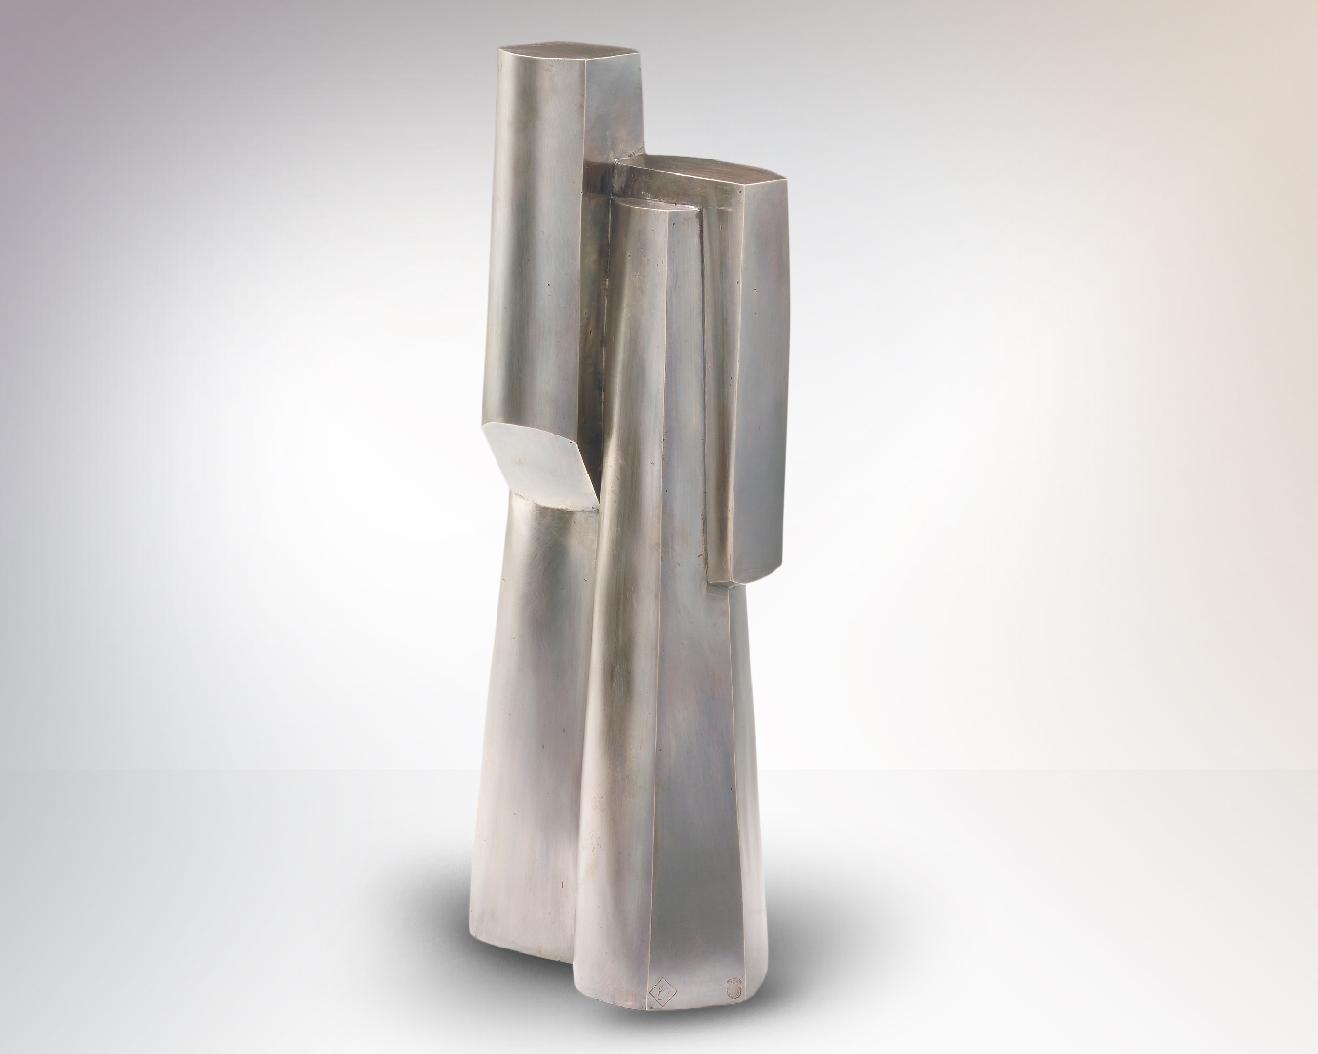 Sculpture-Carola-Eggeling-SavannahBay-turm